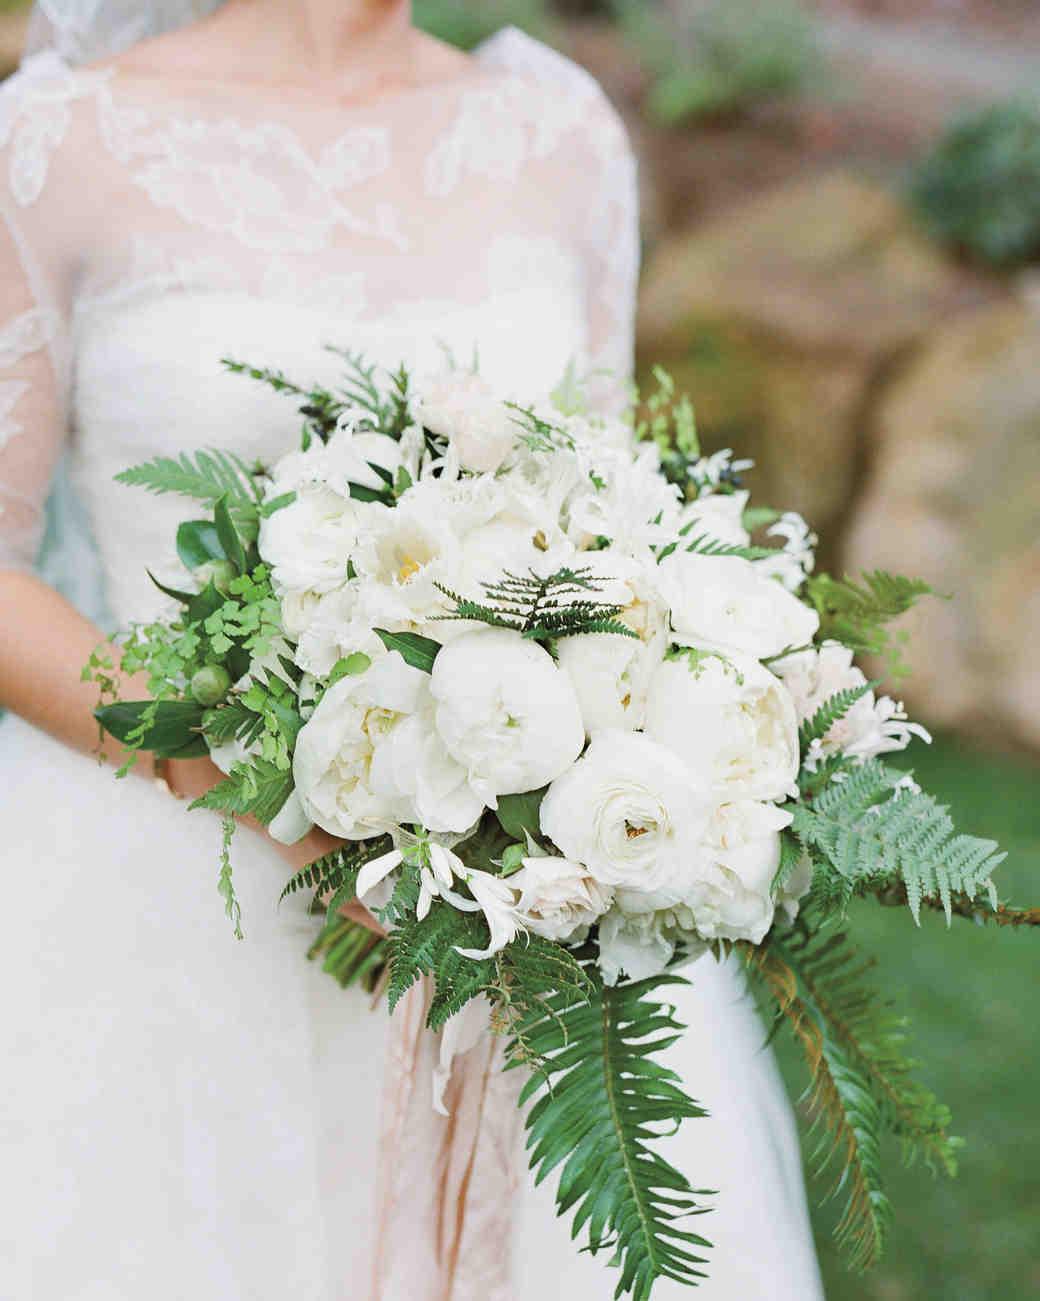 Cheap Wedding Bouquet Ideas - Best wedding ideas. All about party ...